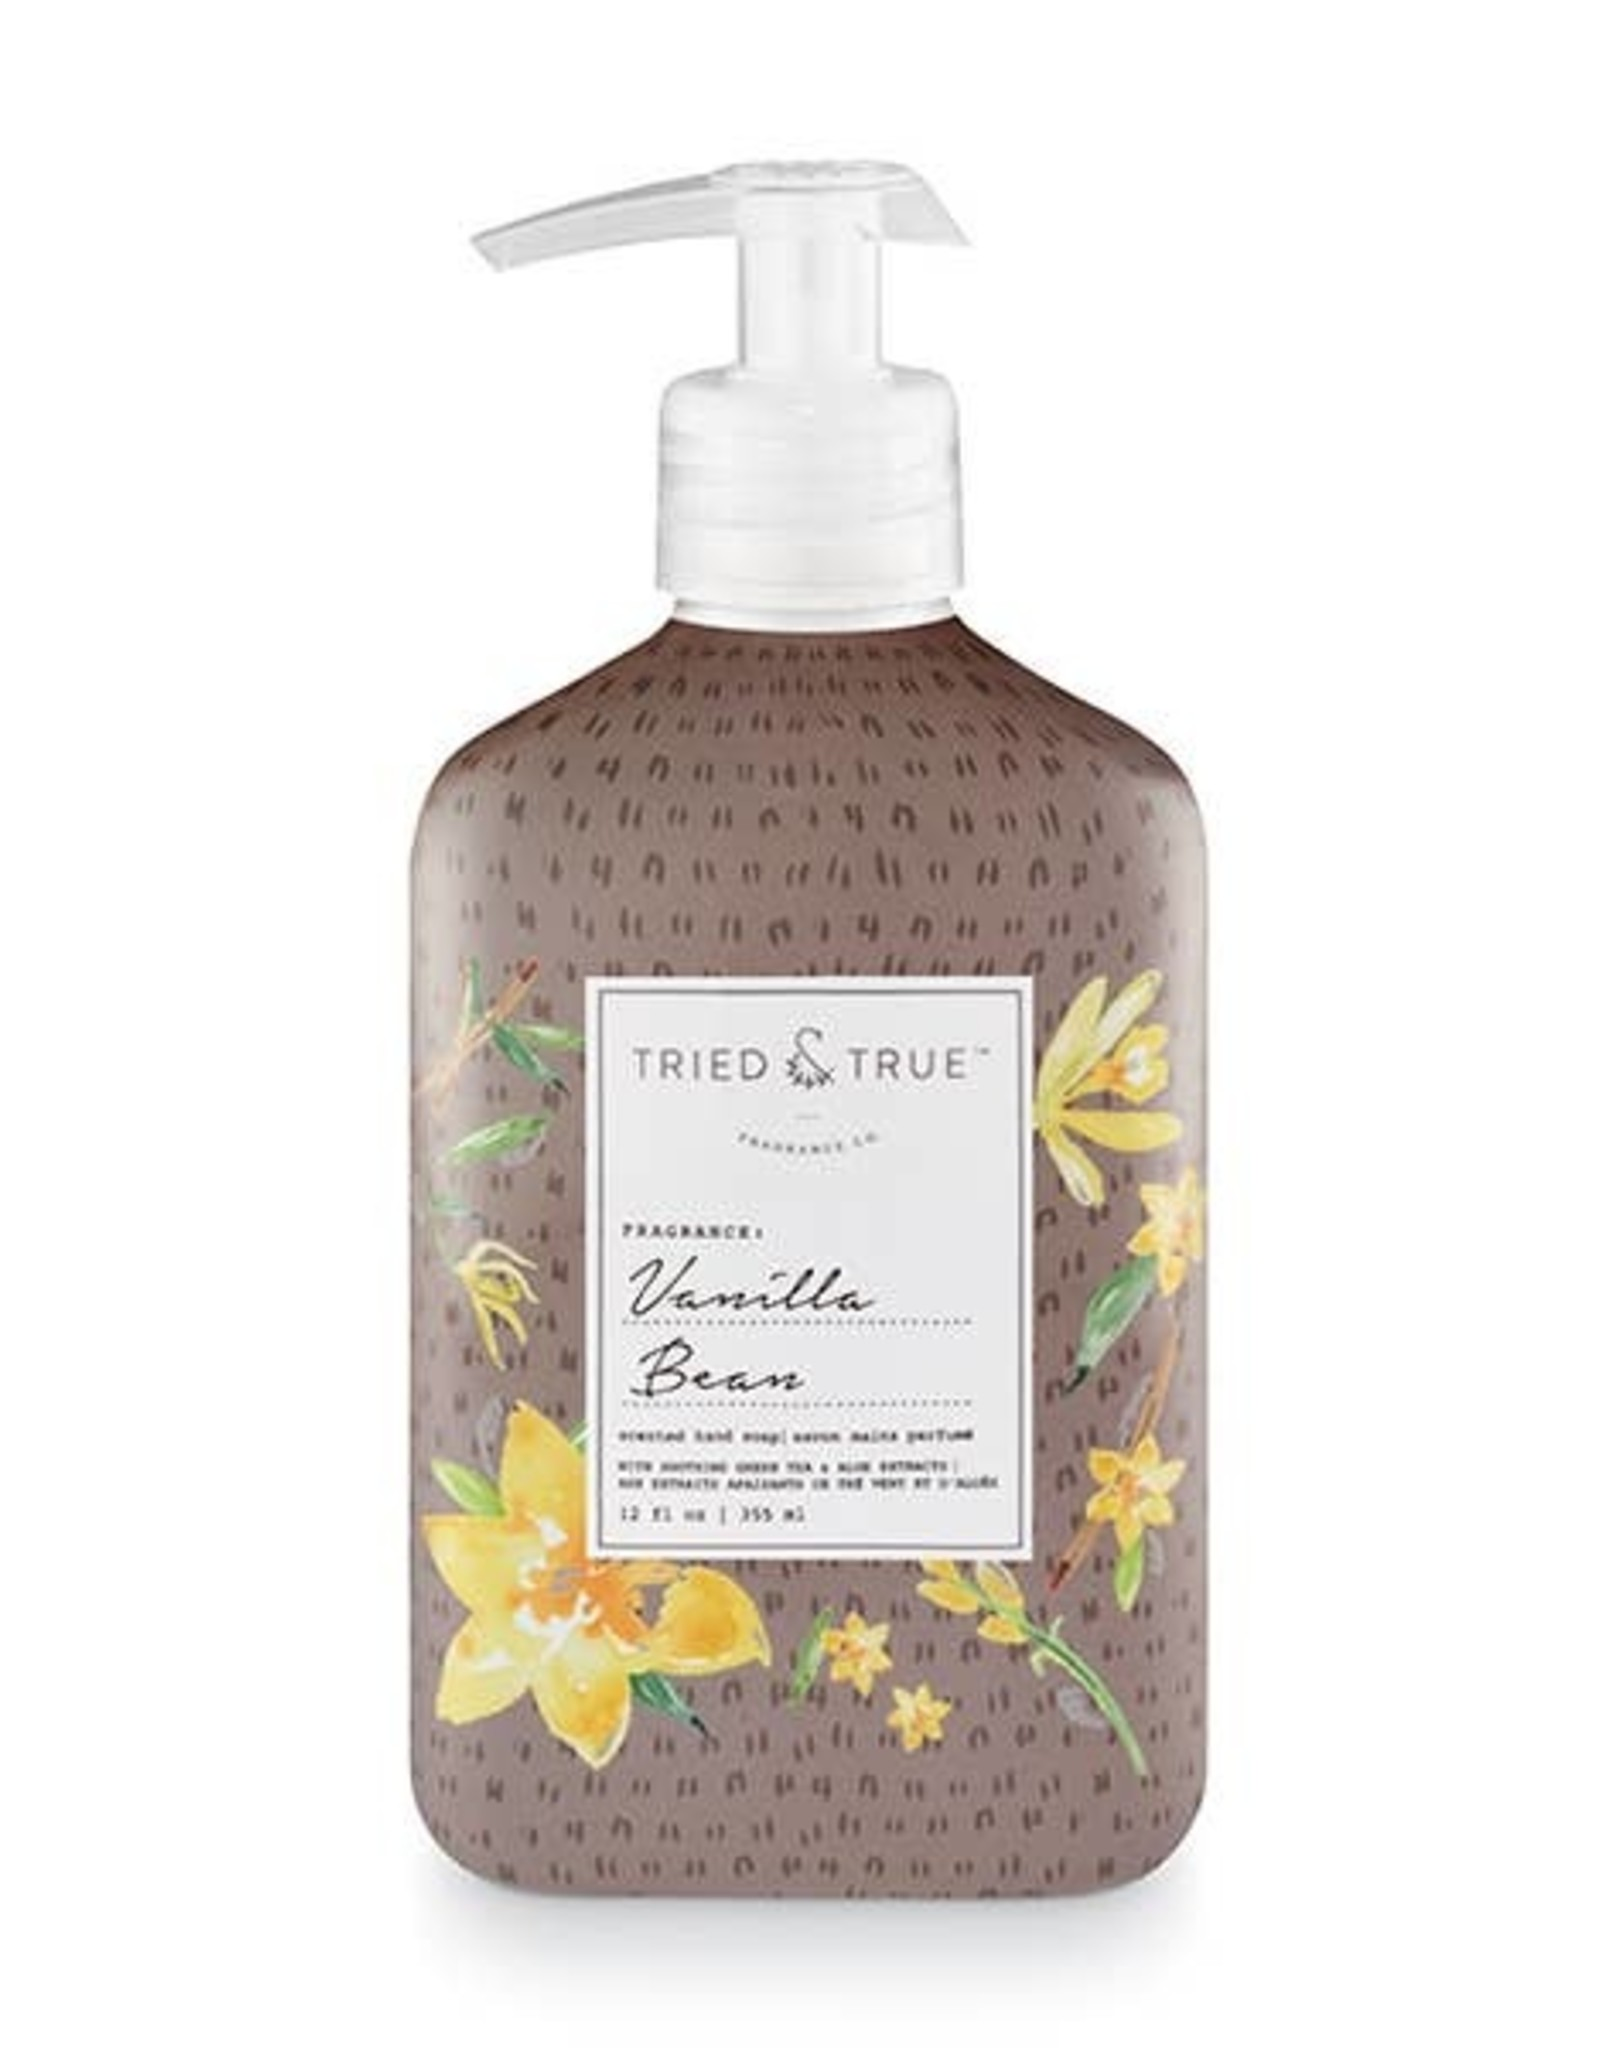 Tried & True Tried & True   Vanilla Bean Hand Wash